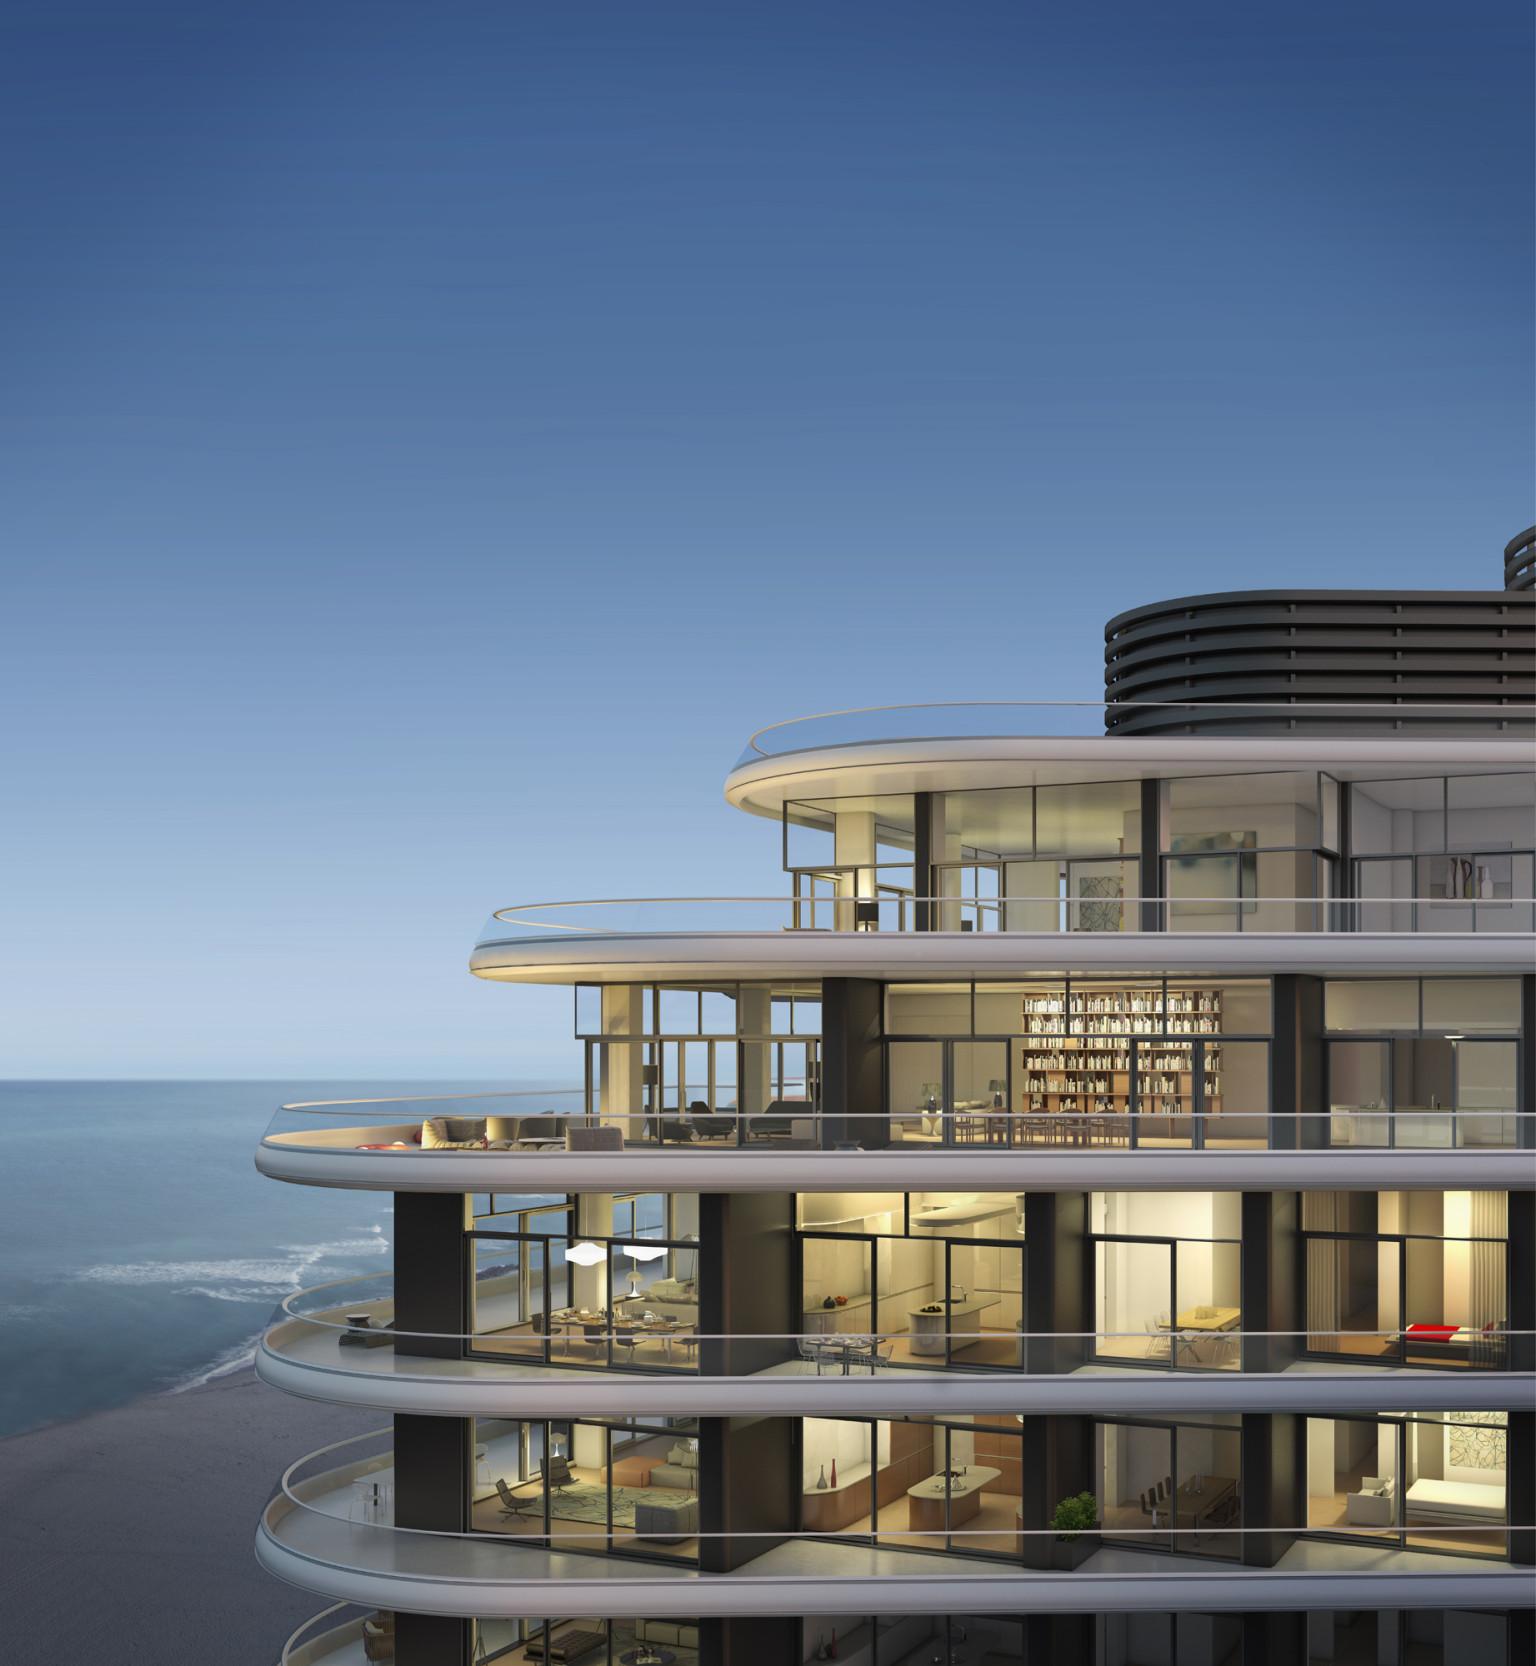 Faena house miami beach features insane balconies cool for 530 terrace ave virginia beach